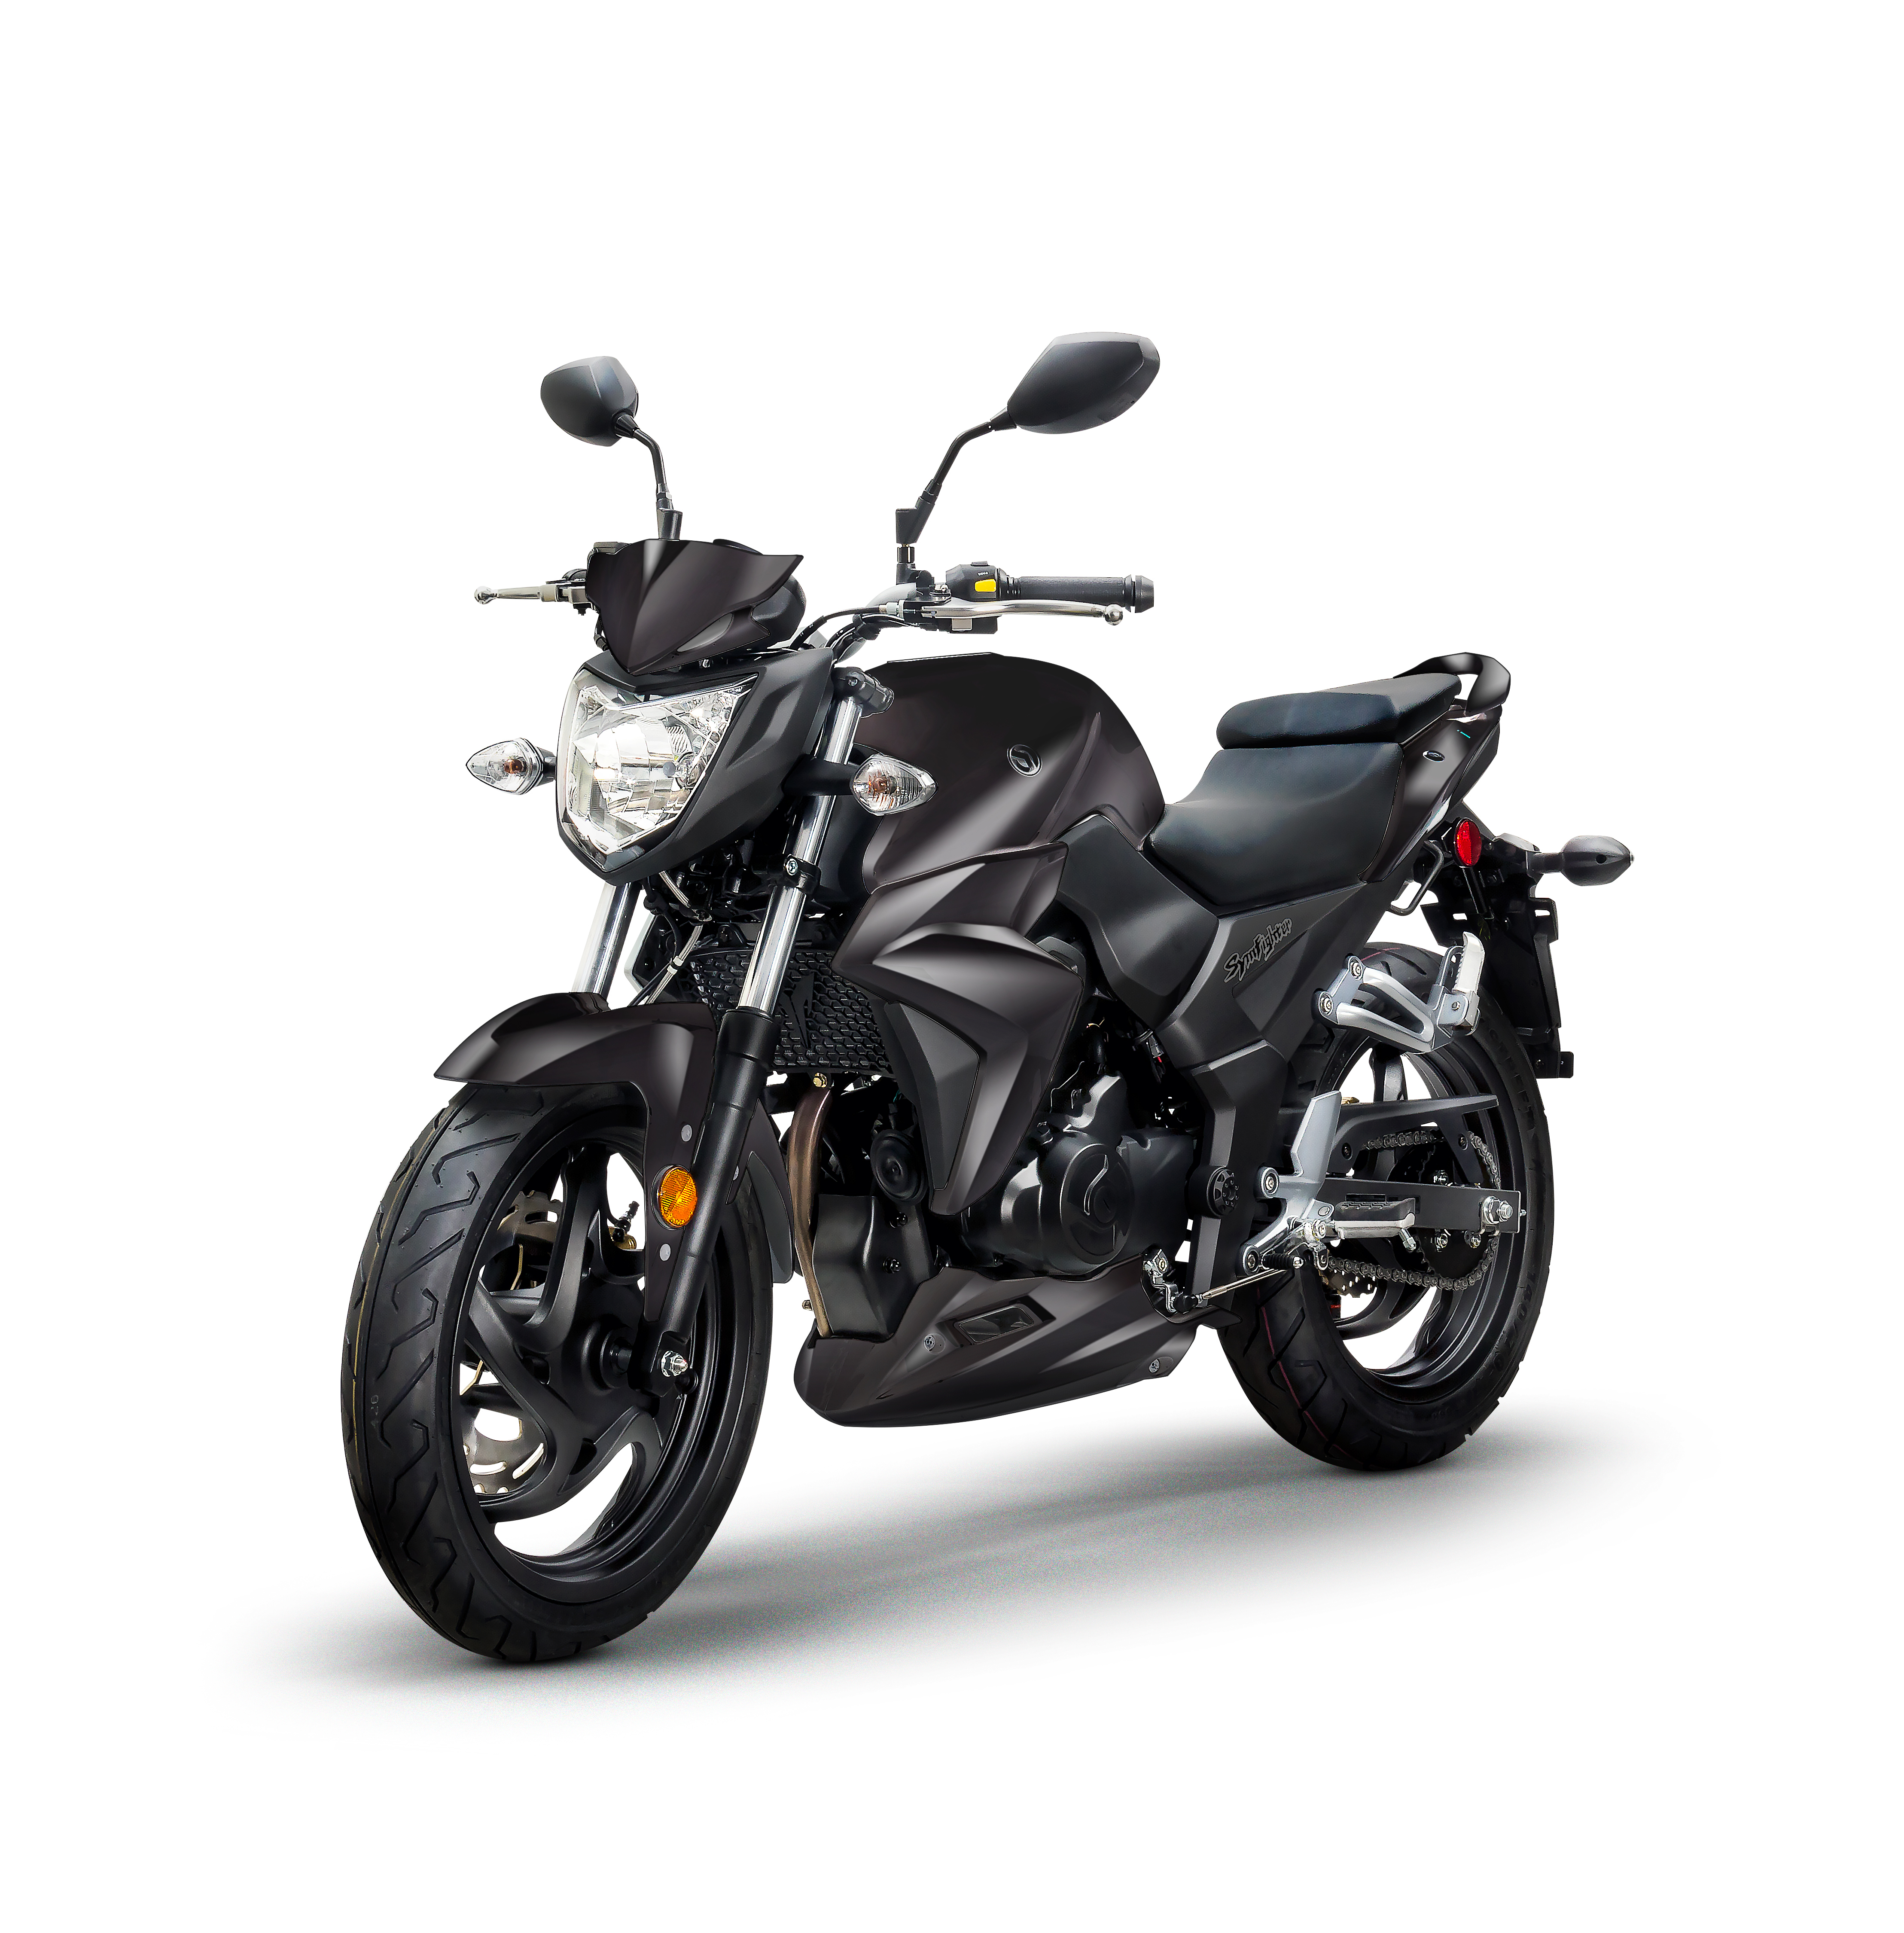 Black Sym T2 250i_Scoots